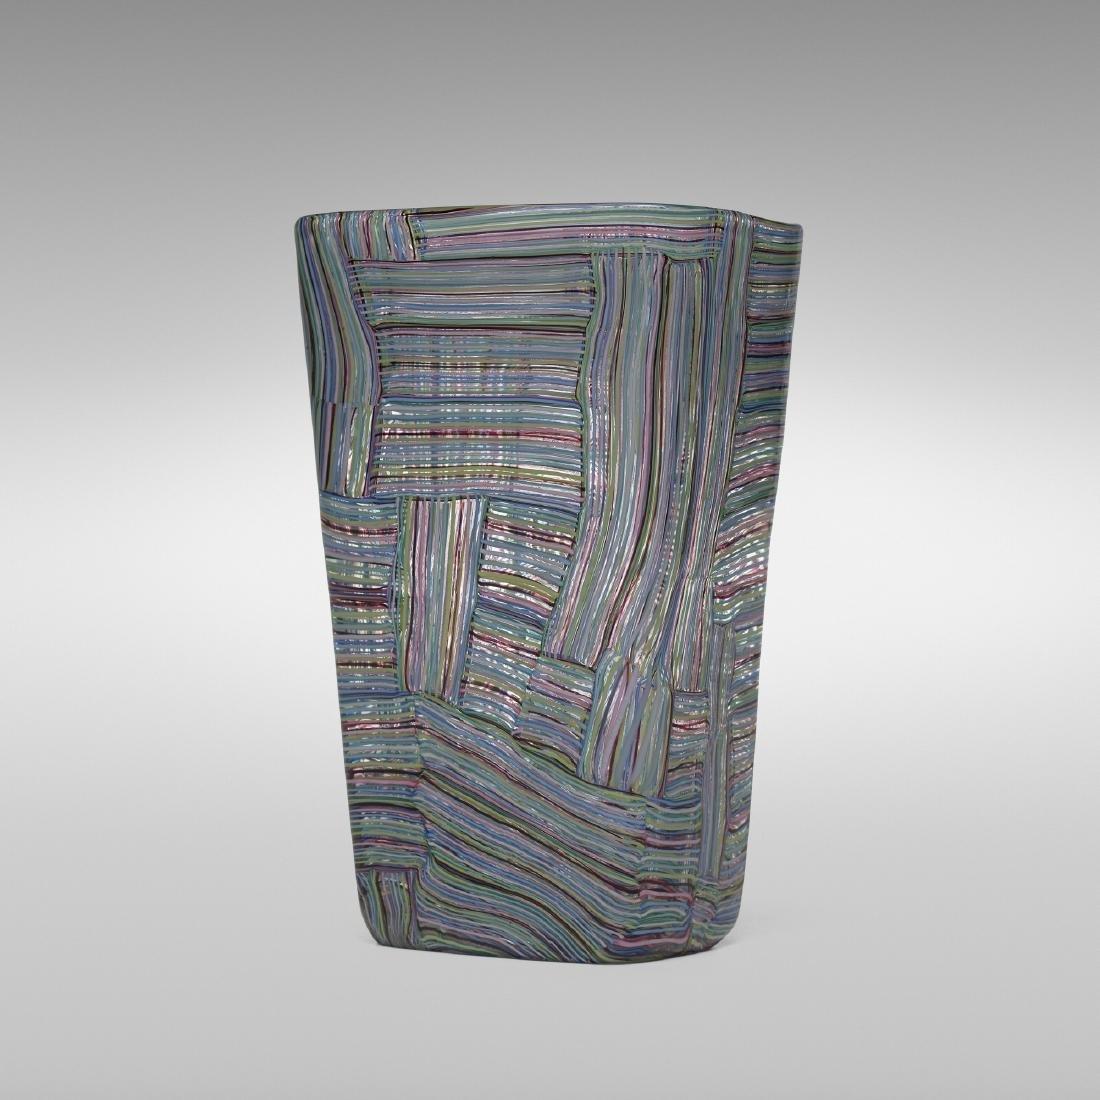 Paolo Venini, Rare Mosaico Tessuto vase, model 3850